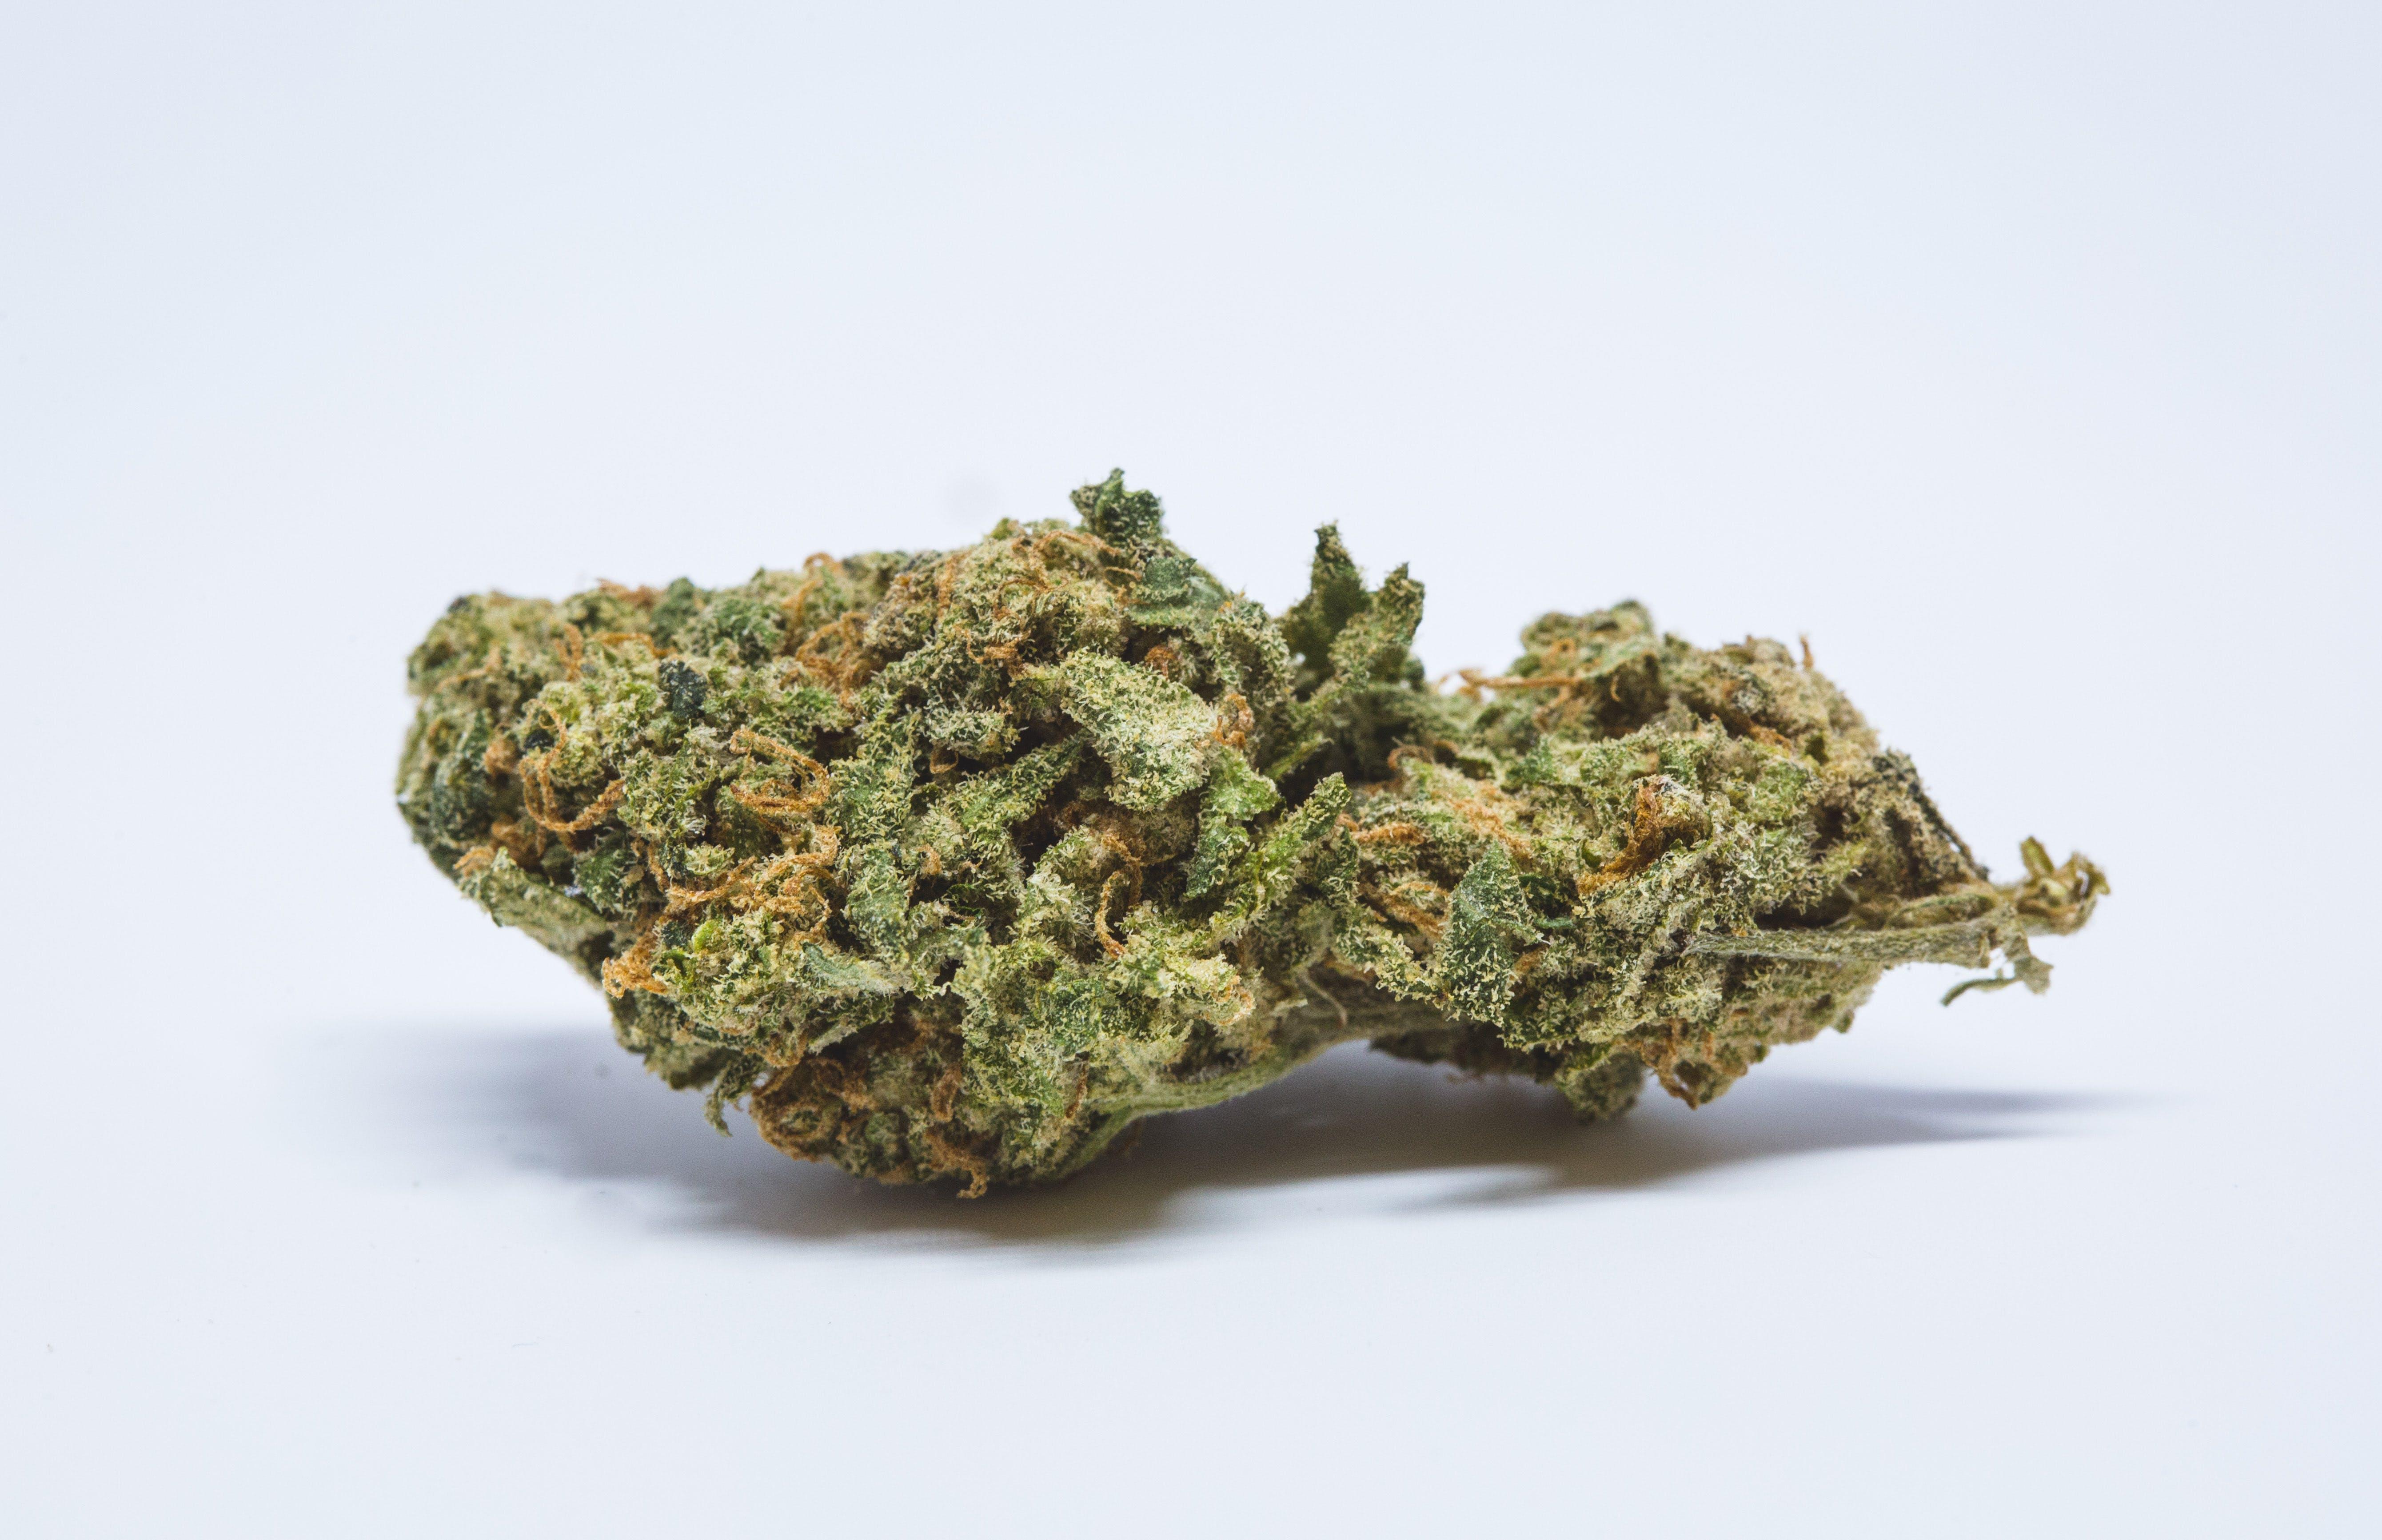 Candy Kush Weed; Candy Kush Cannabis Strain; Candy Kush Hybrid Marijuana Strain